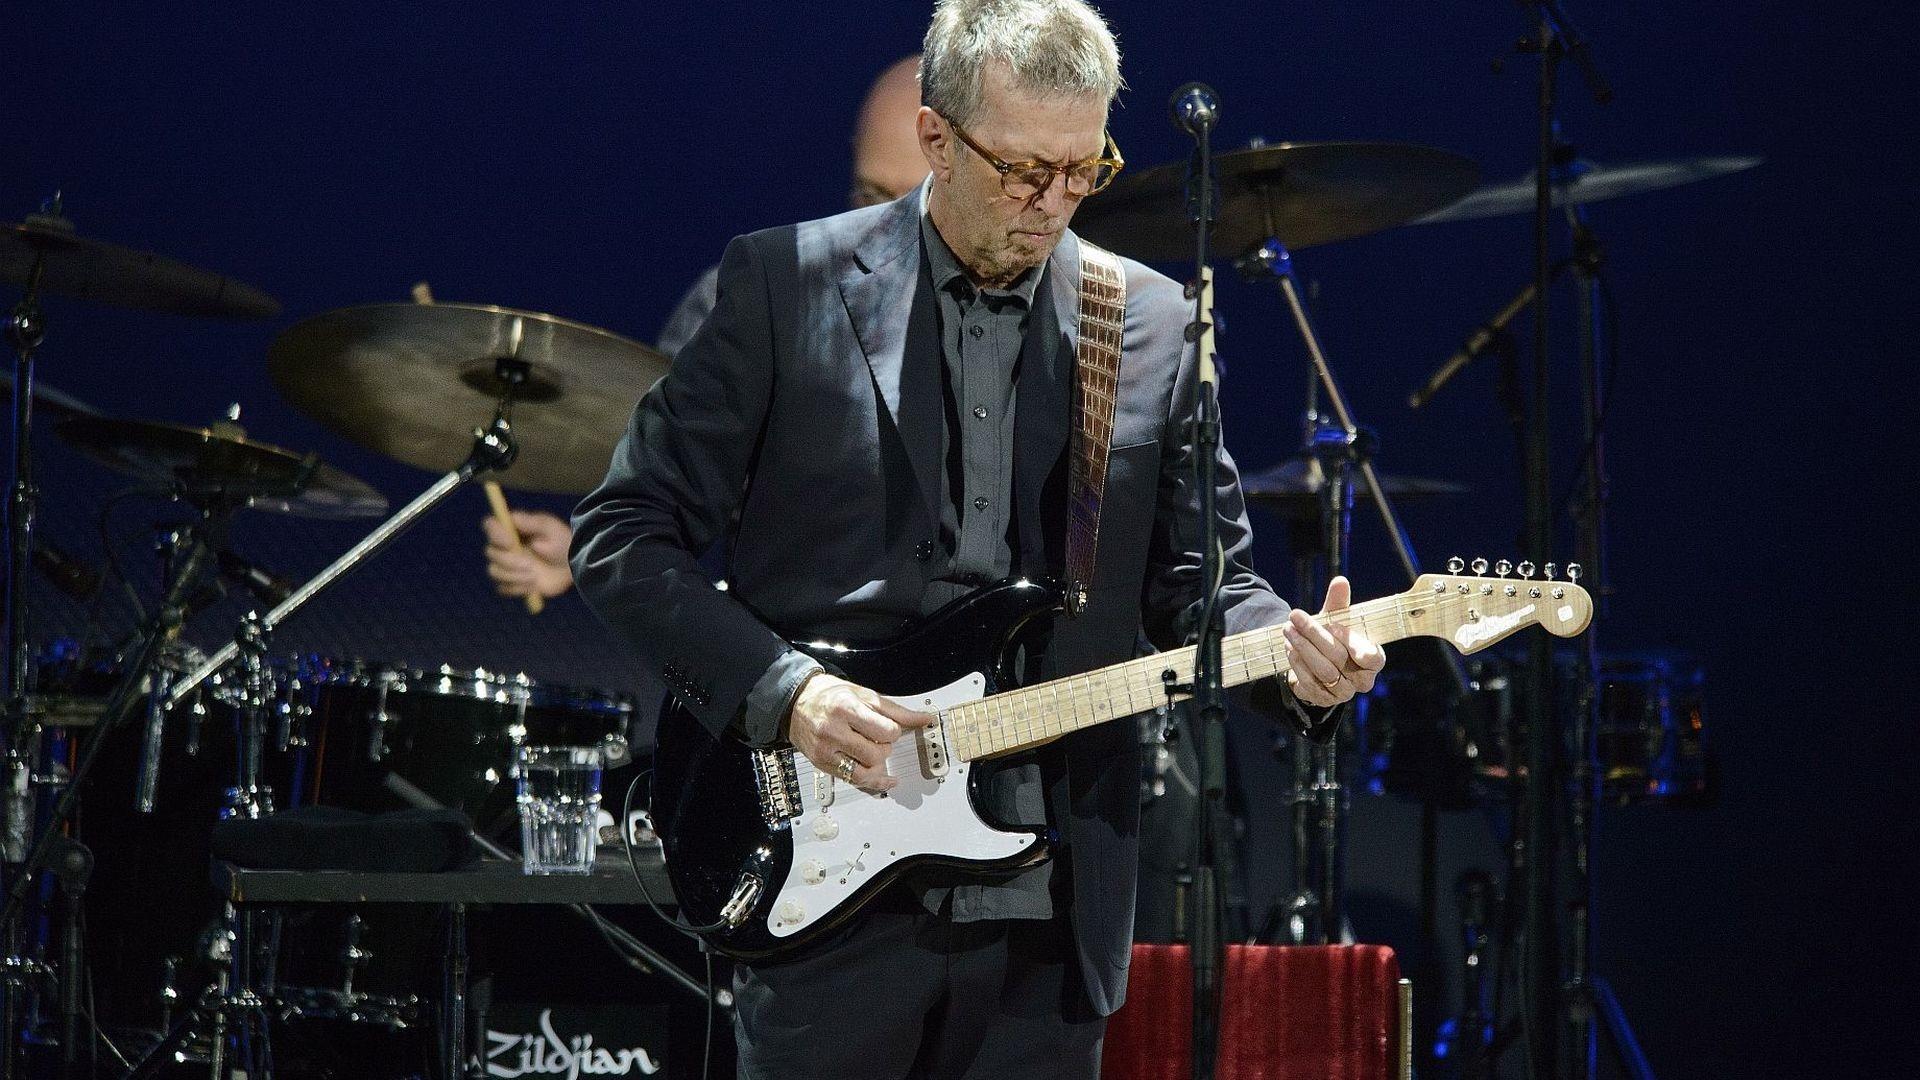 Eric Clapton Wallpaper 71 Images